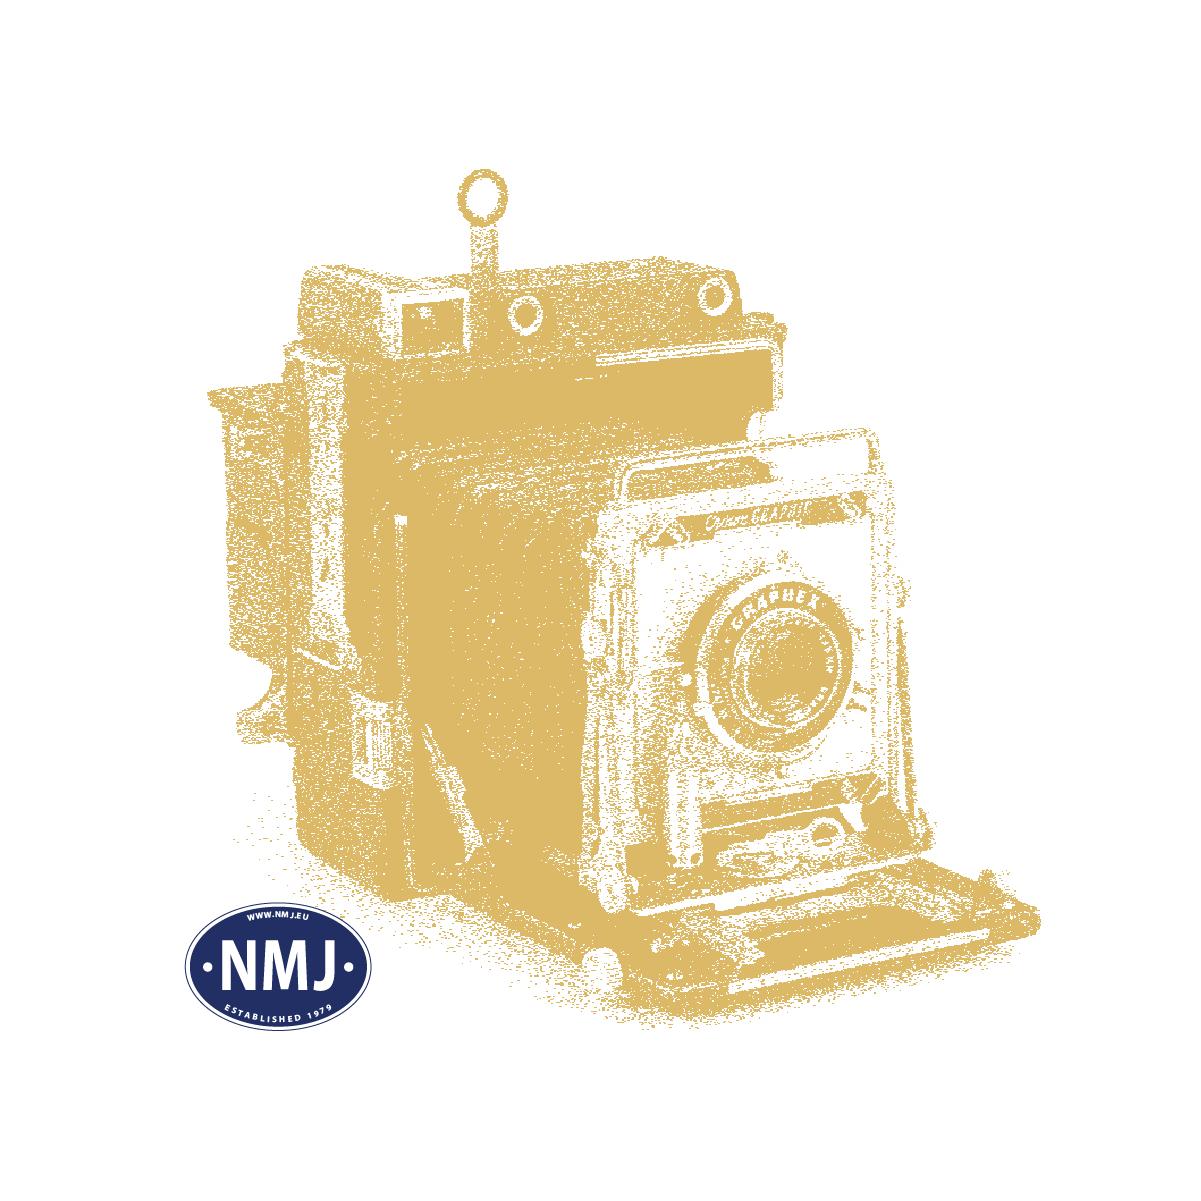 NMJT107.303 - NMJ Topline NSB B3-2 25593 Nydesign